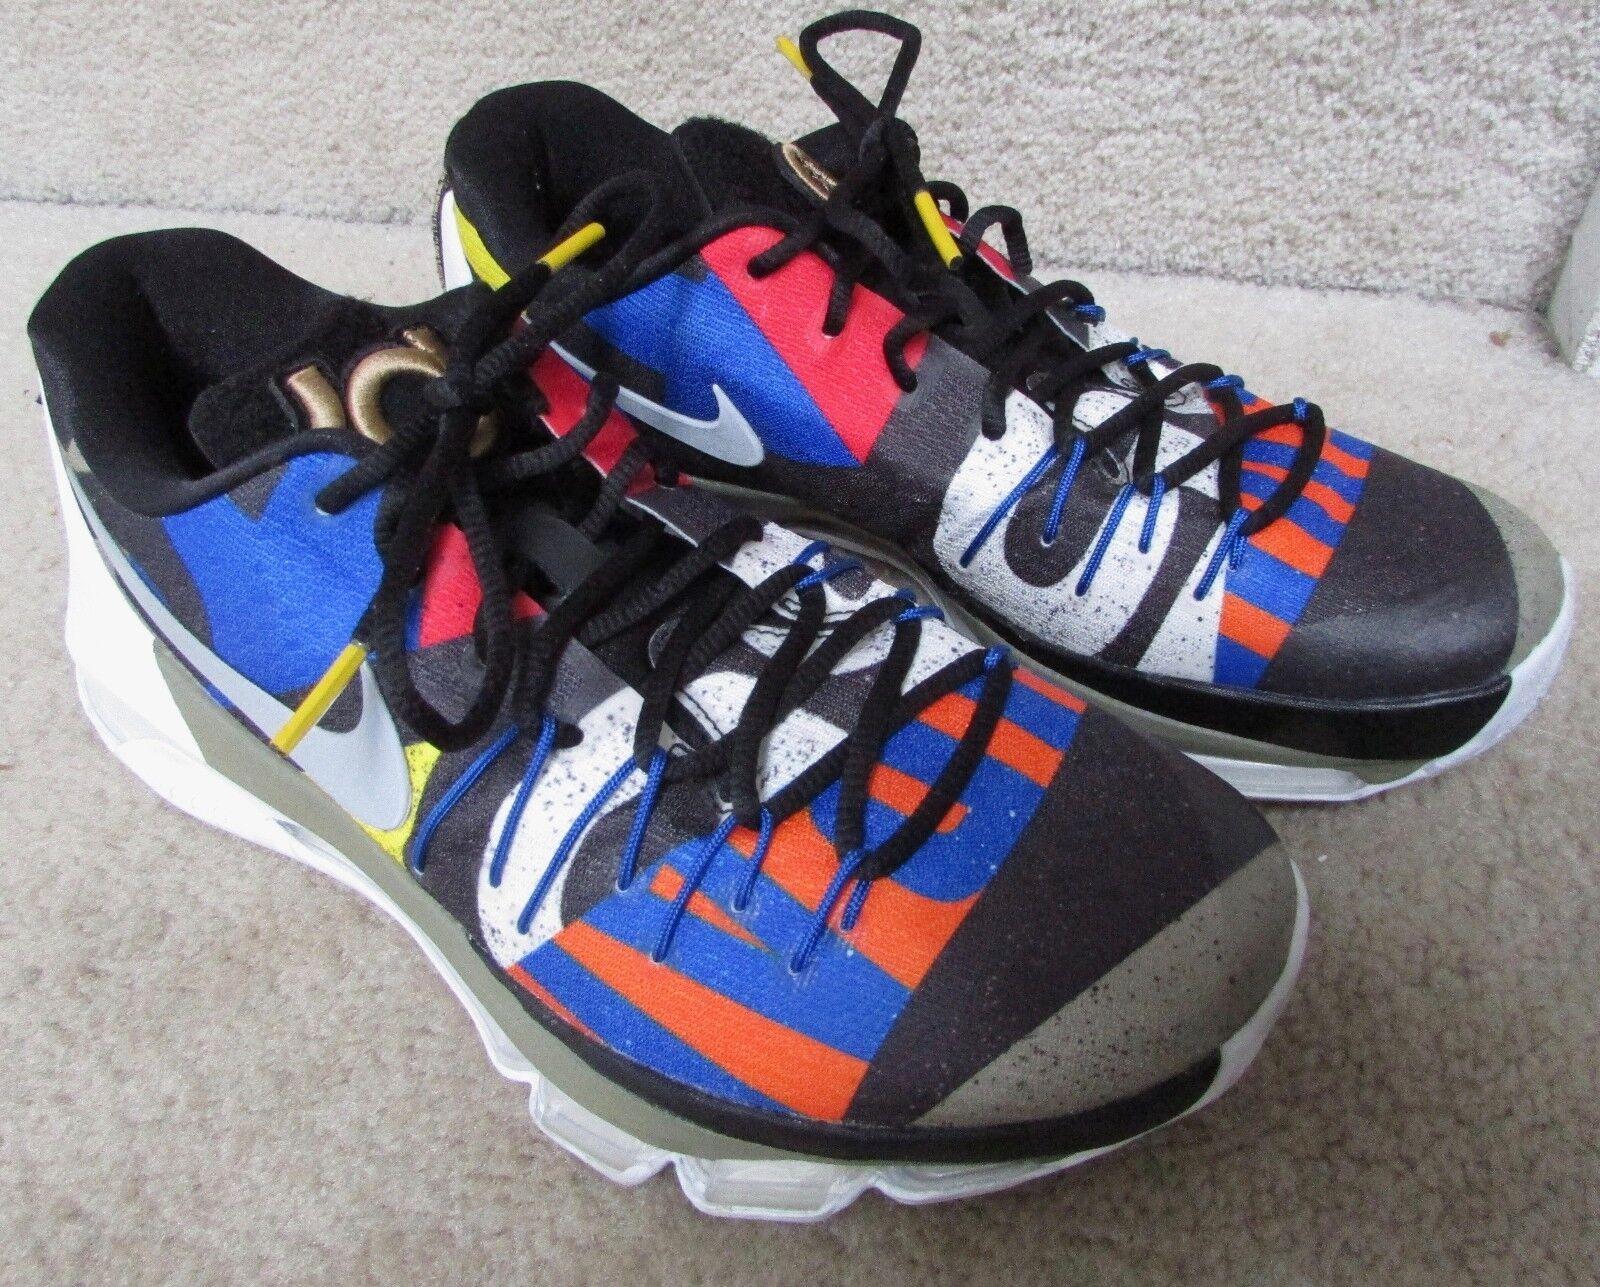 Nike kd 8 come stella reale 829207-100 durant scarpe da basket sz campioni